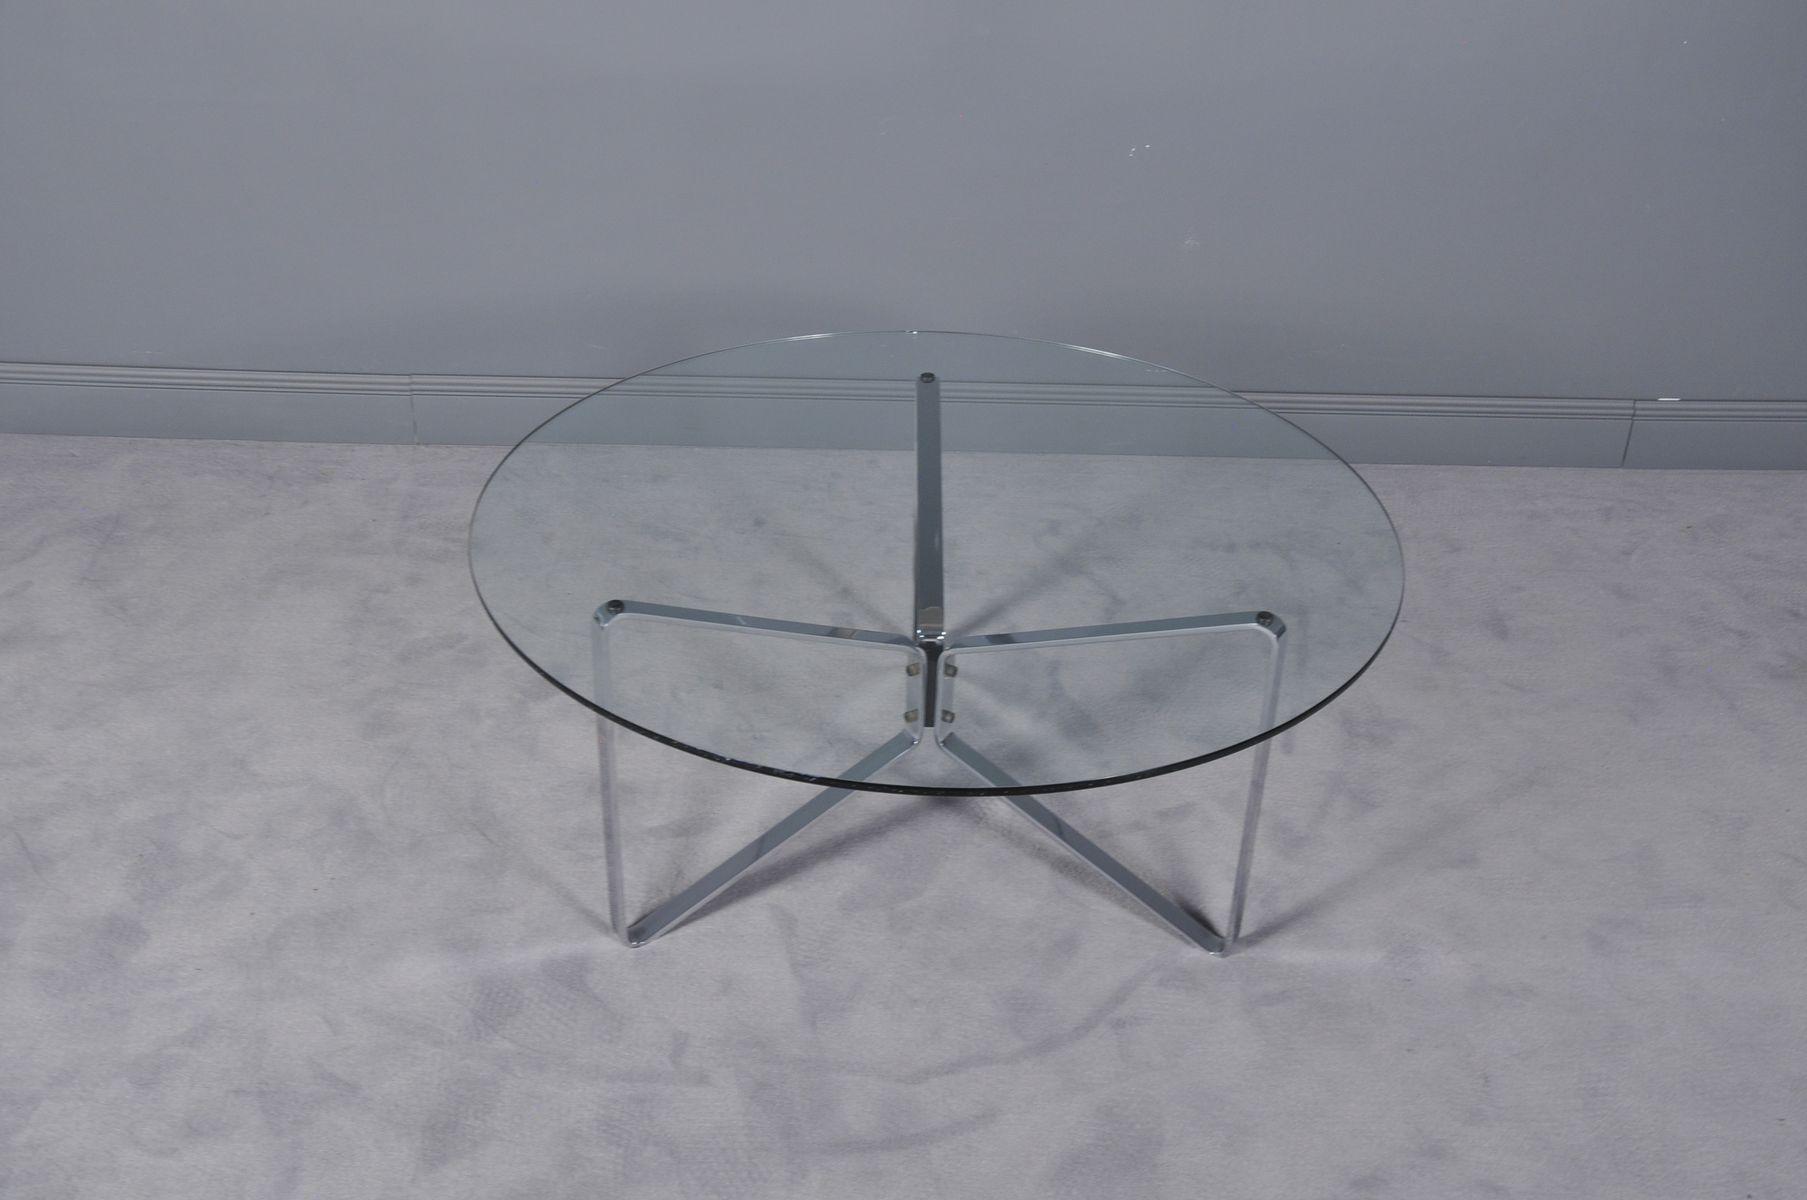 table basse ronde en verre 1970s en vente sur pamono. Black Bedroom Furniture Sets. Home Design Ideas